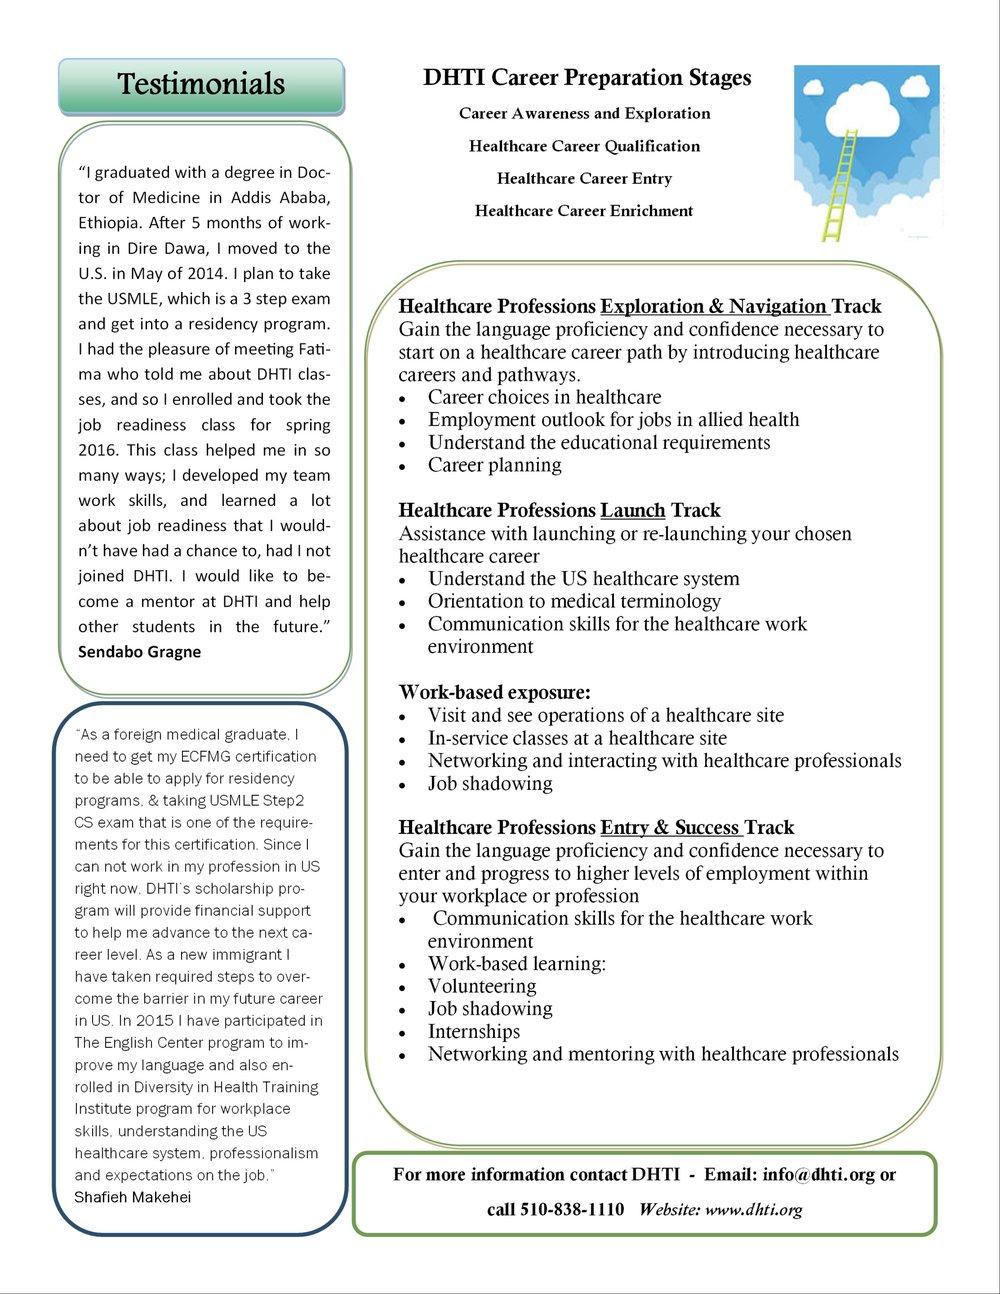 HCAW Dec 2017 Page 2